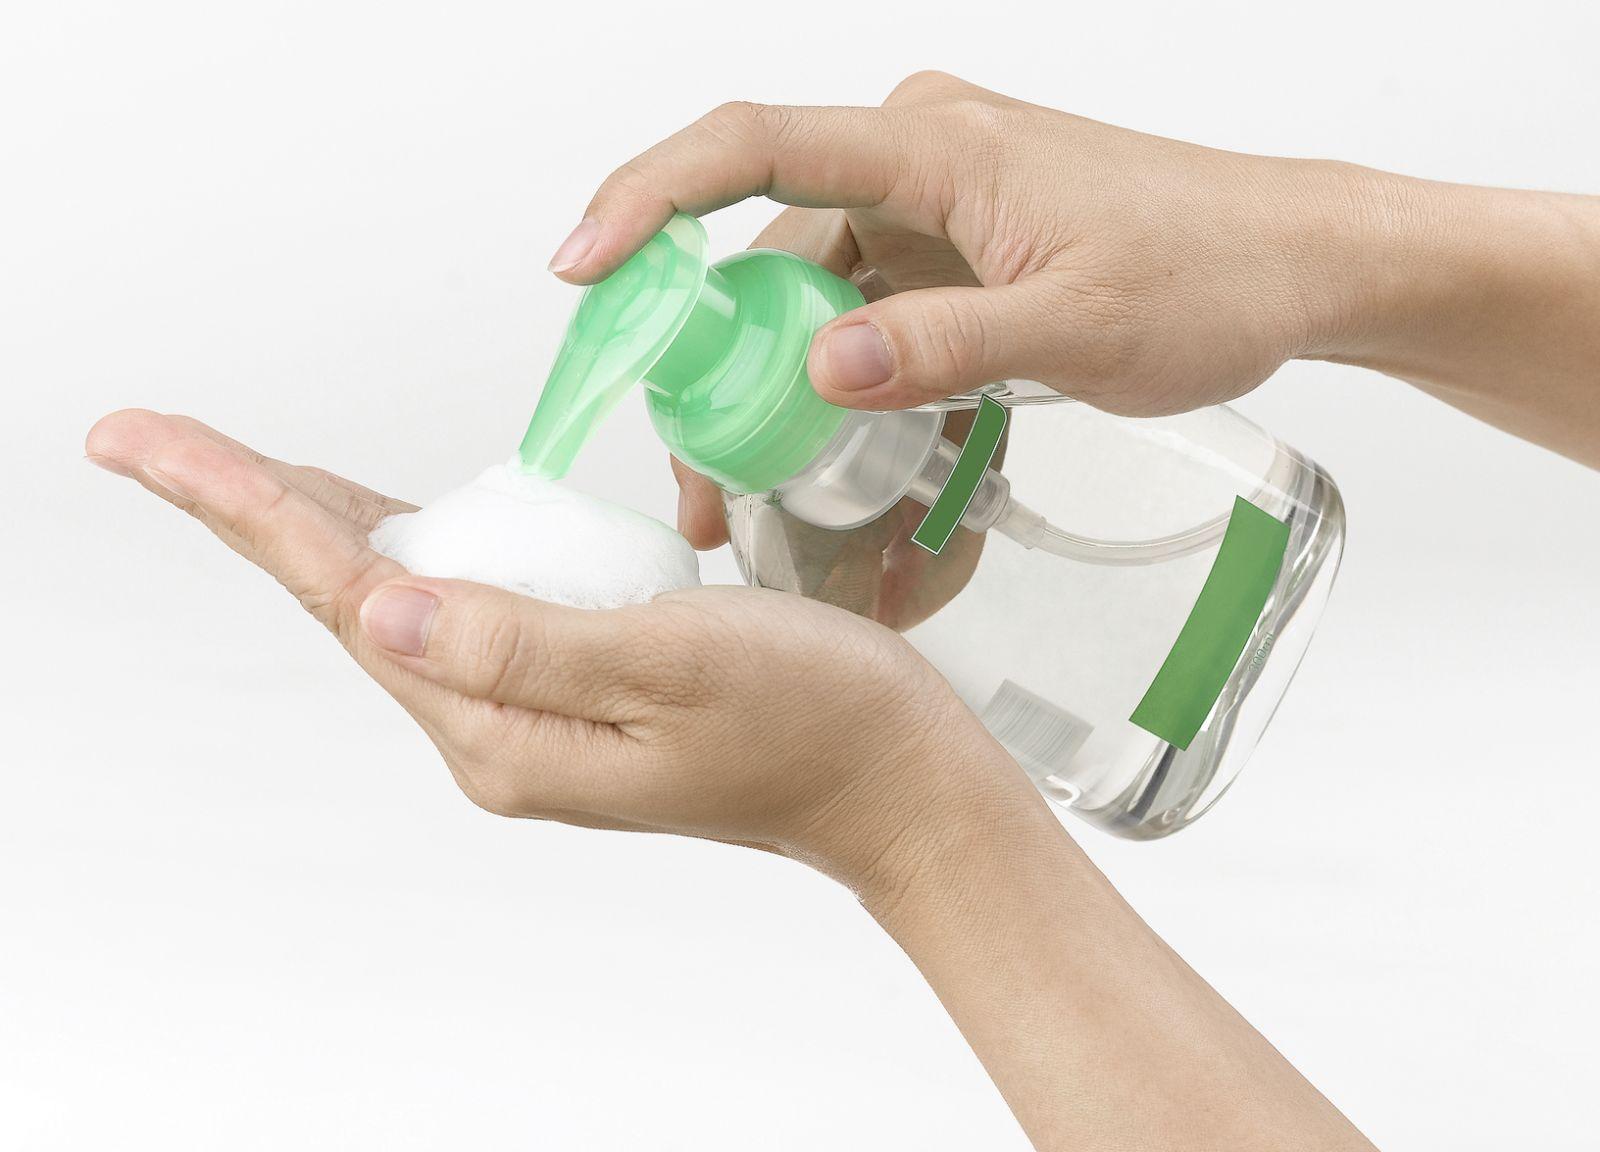 antibacterial-soap-washing-hands-venusphoto-iStock_65907481_MEDIUM